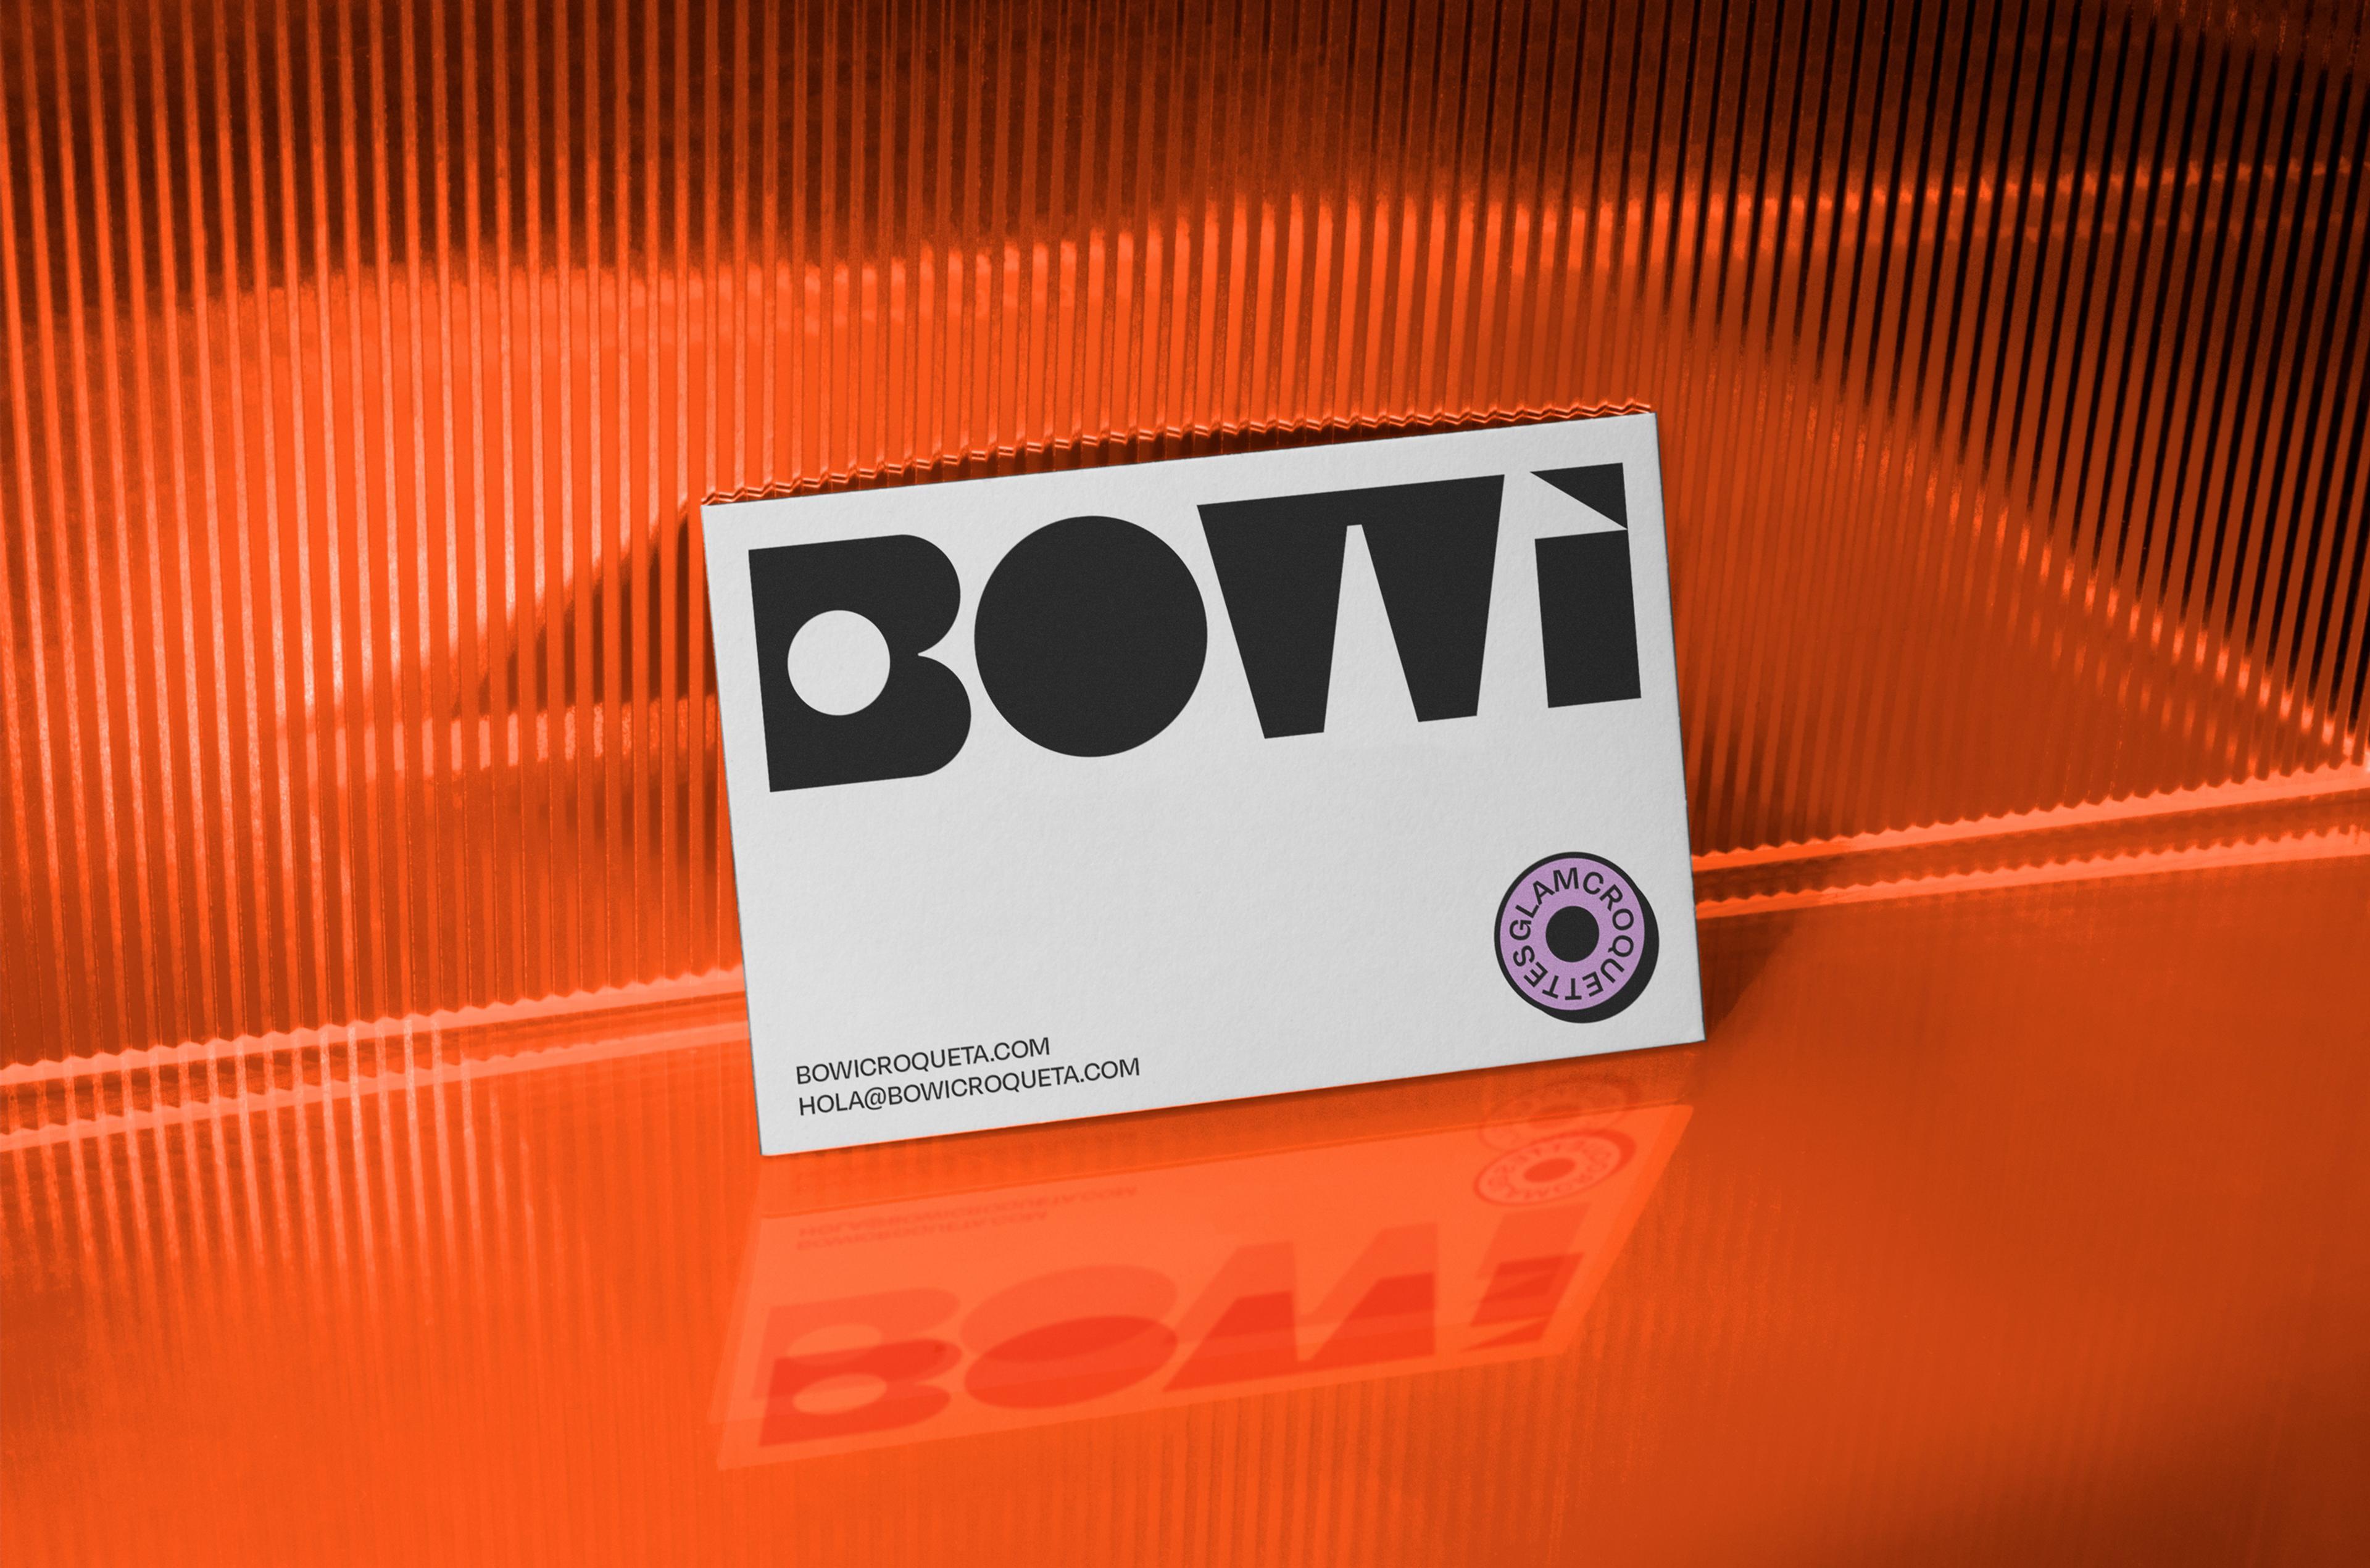 Bowi Croqueta Cards by Blavet Studio